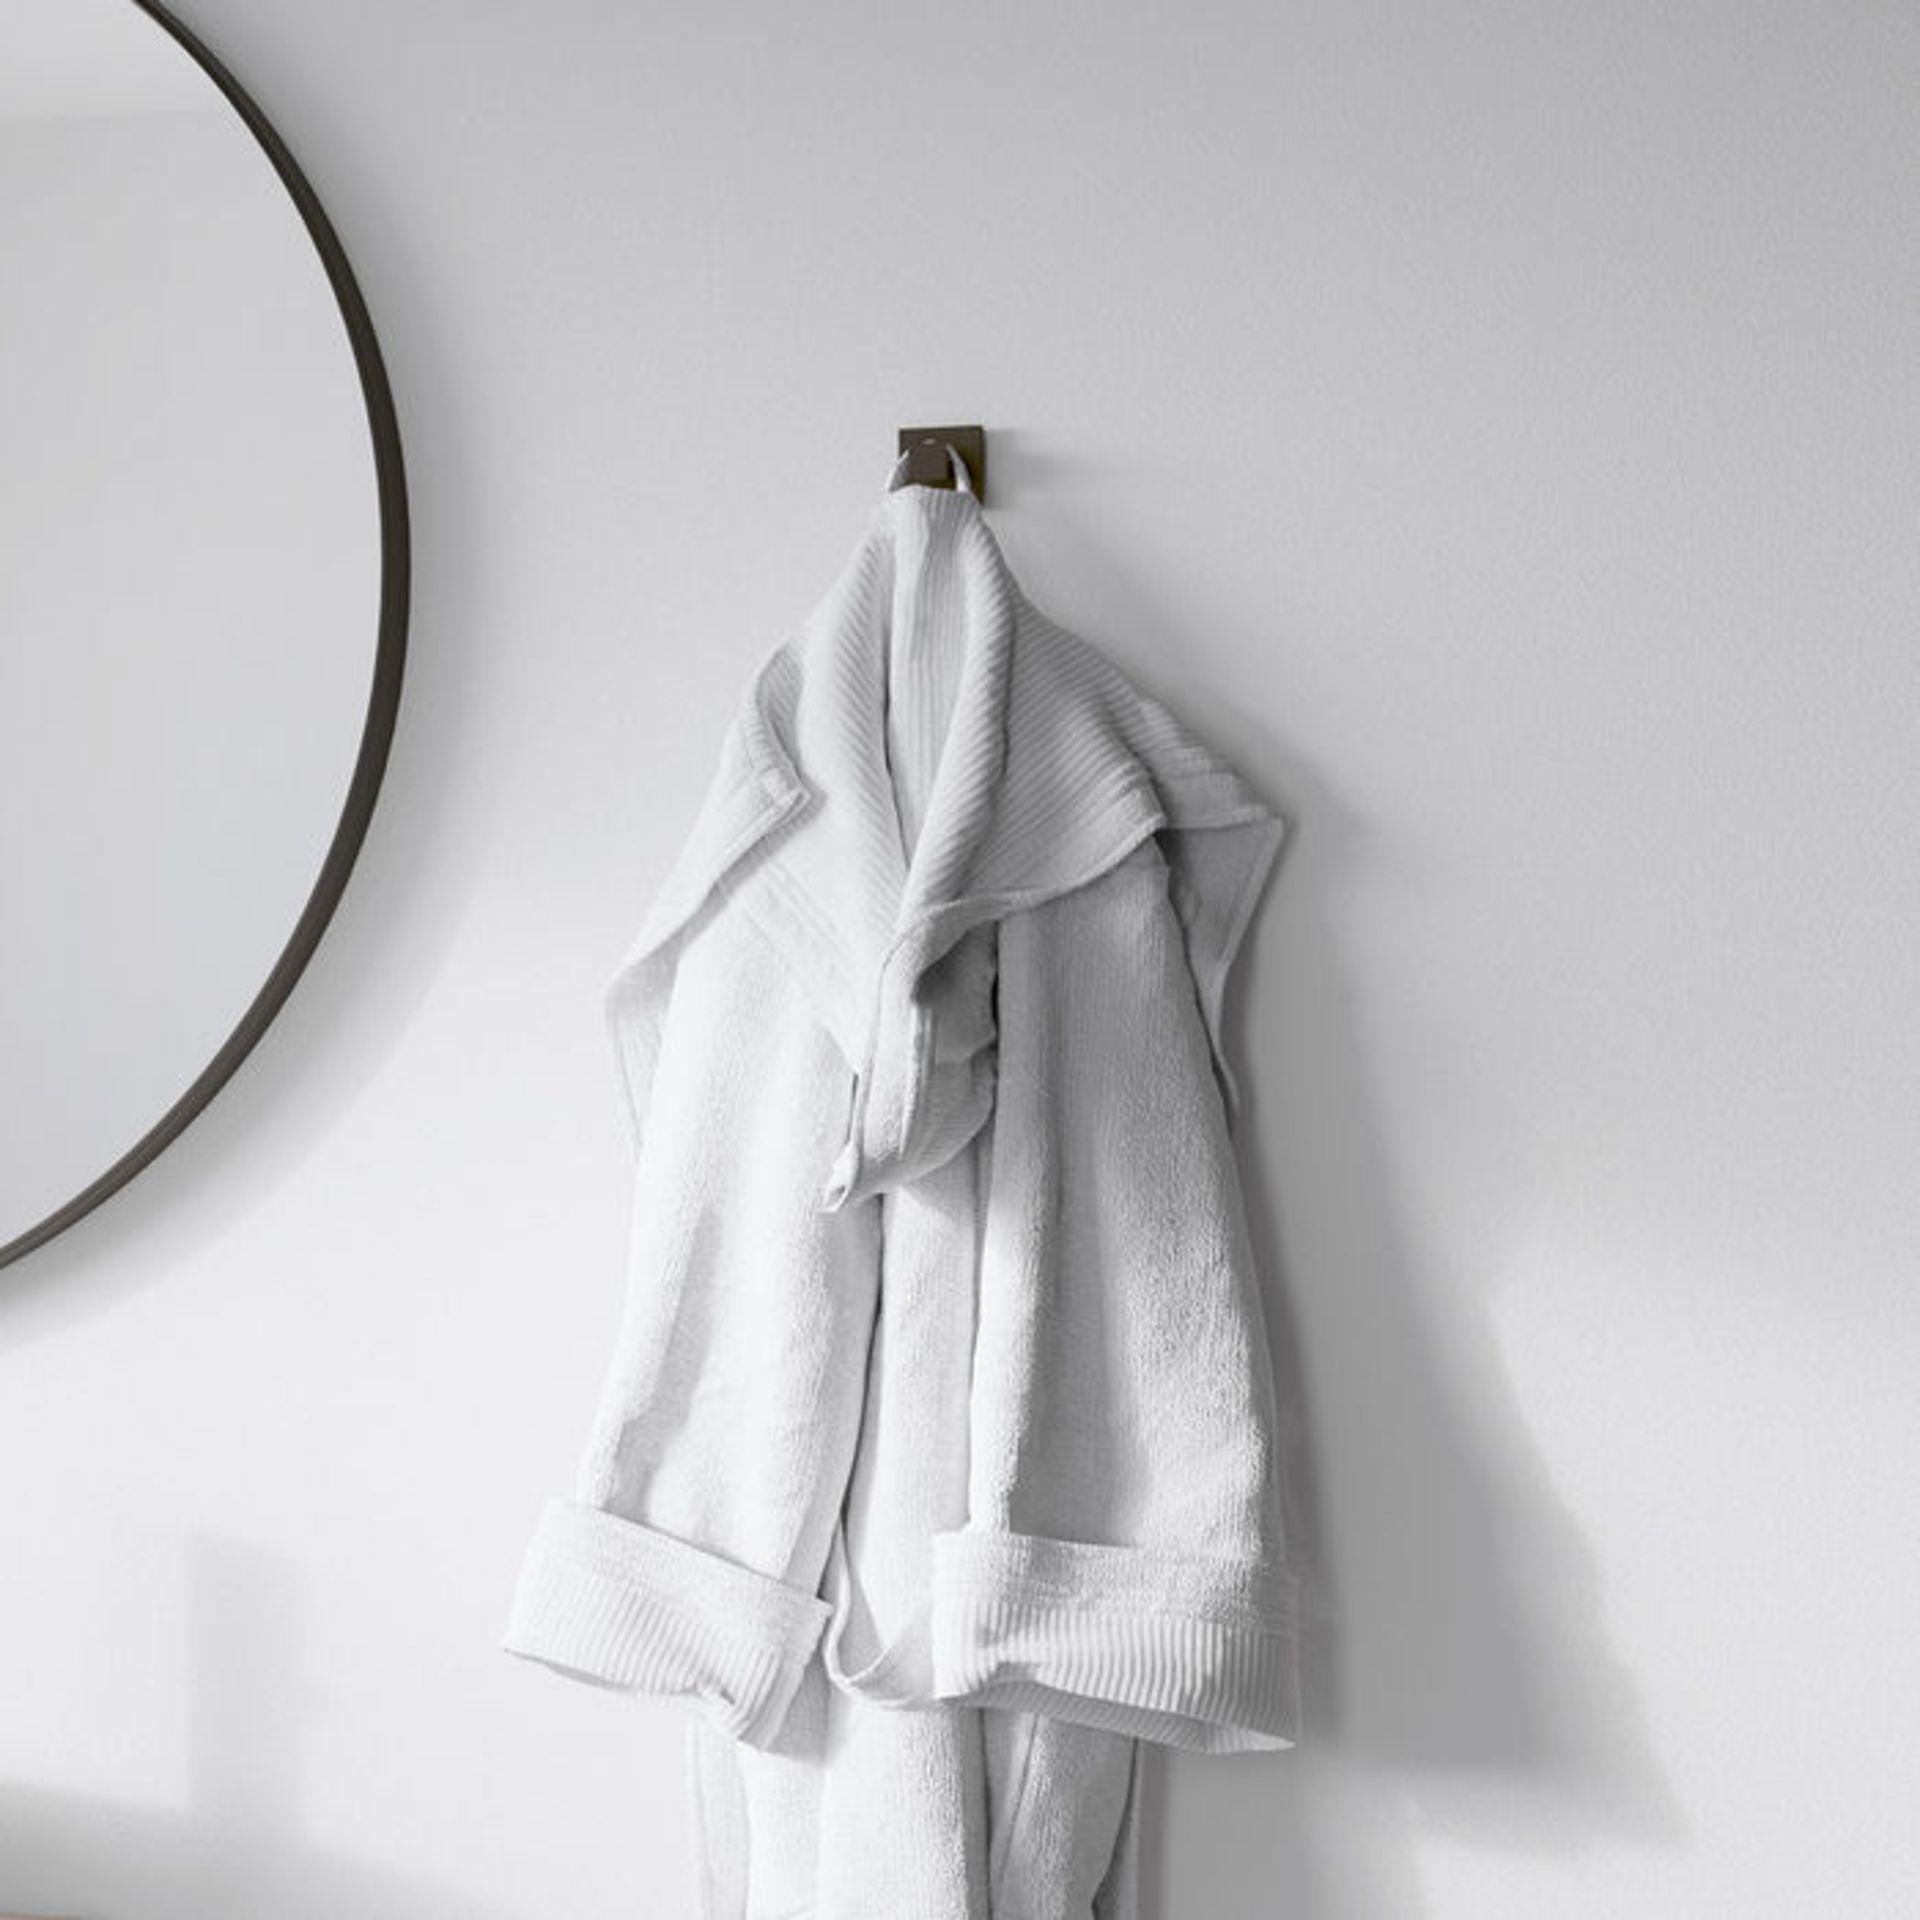 Lot 30 - (DA79) Iker Black Robe Hook Statement aesthetic for minimalist appeal Luxurious, corrosion